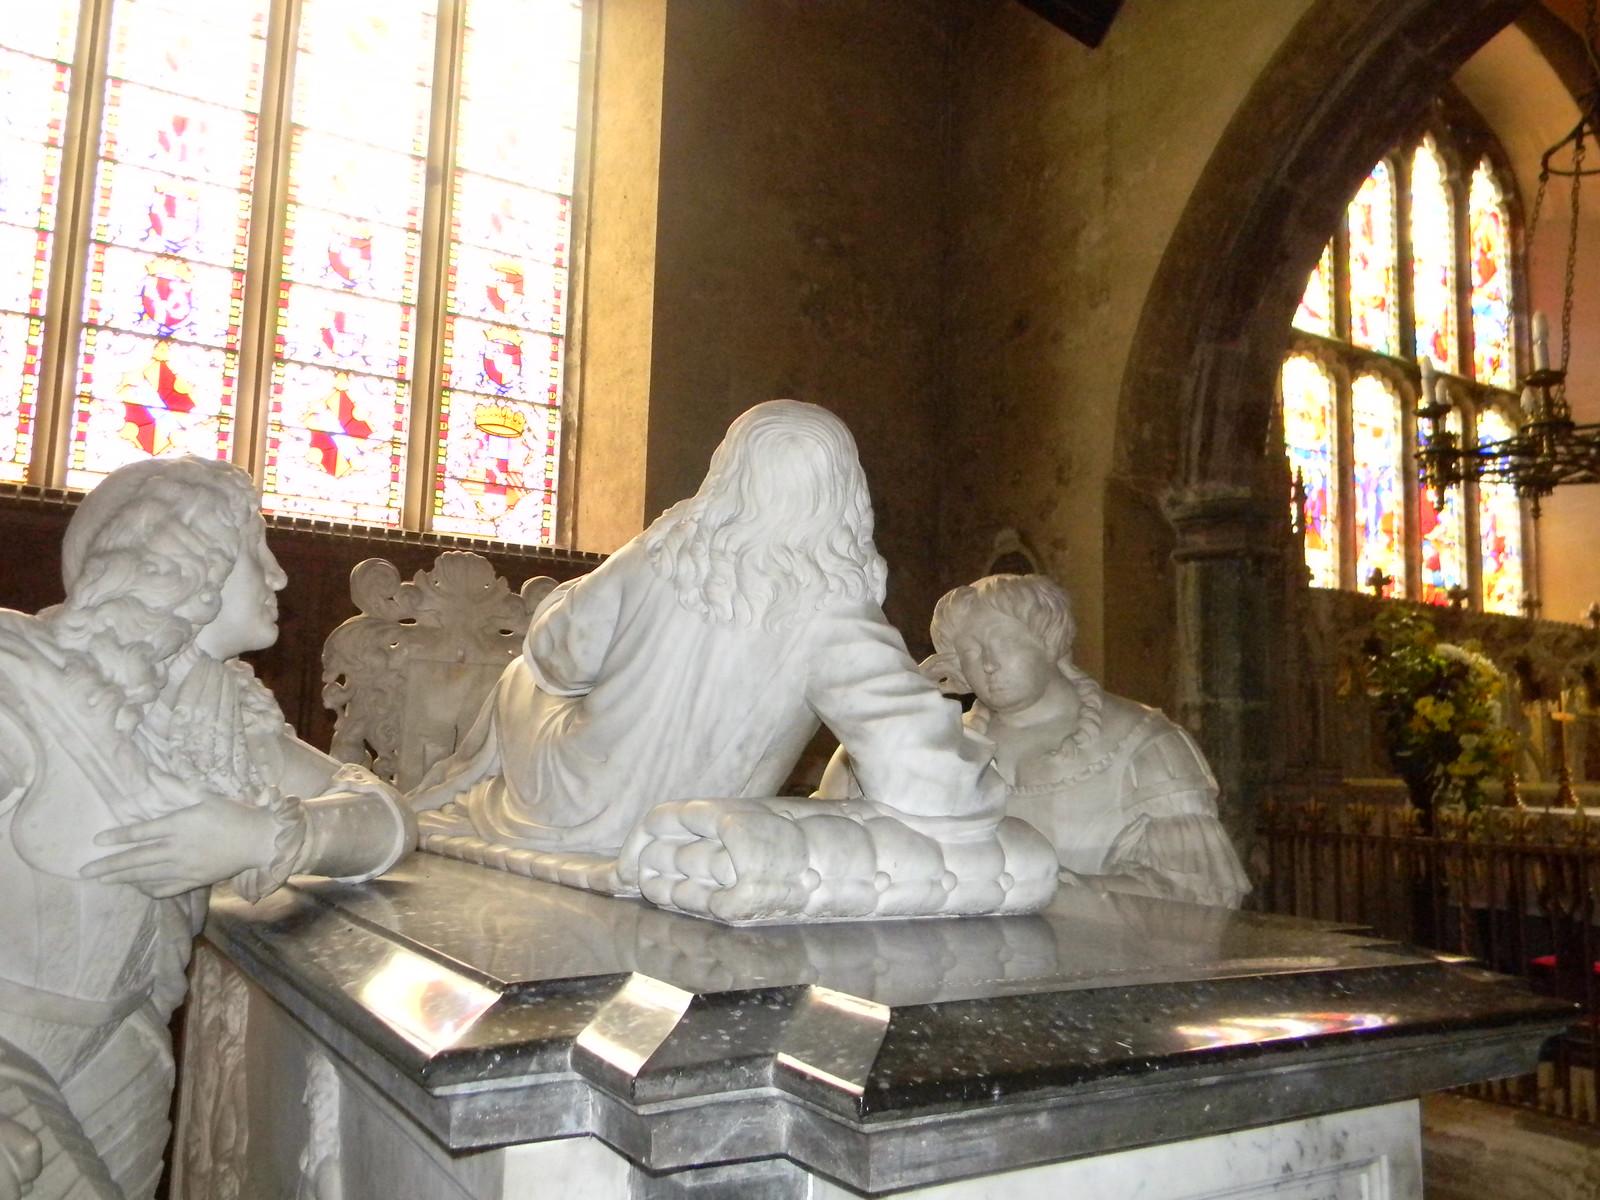 Sackville tomb, Withyam Church Ashurst Circular